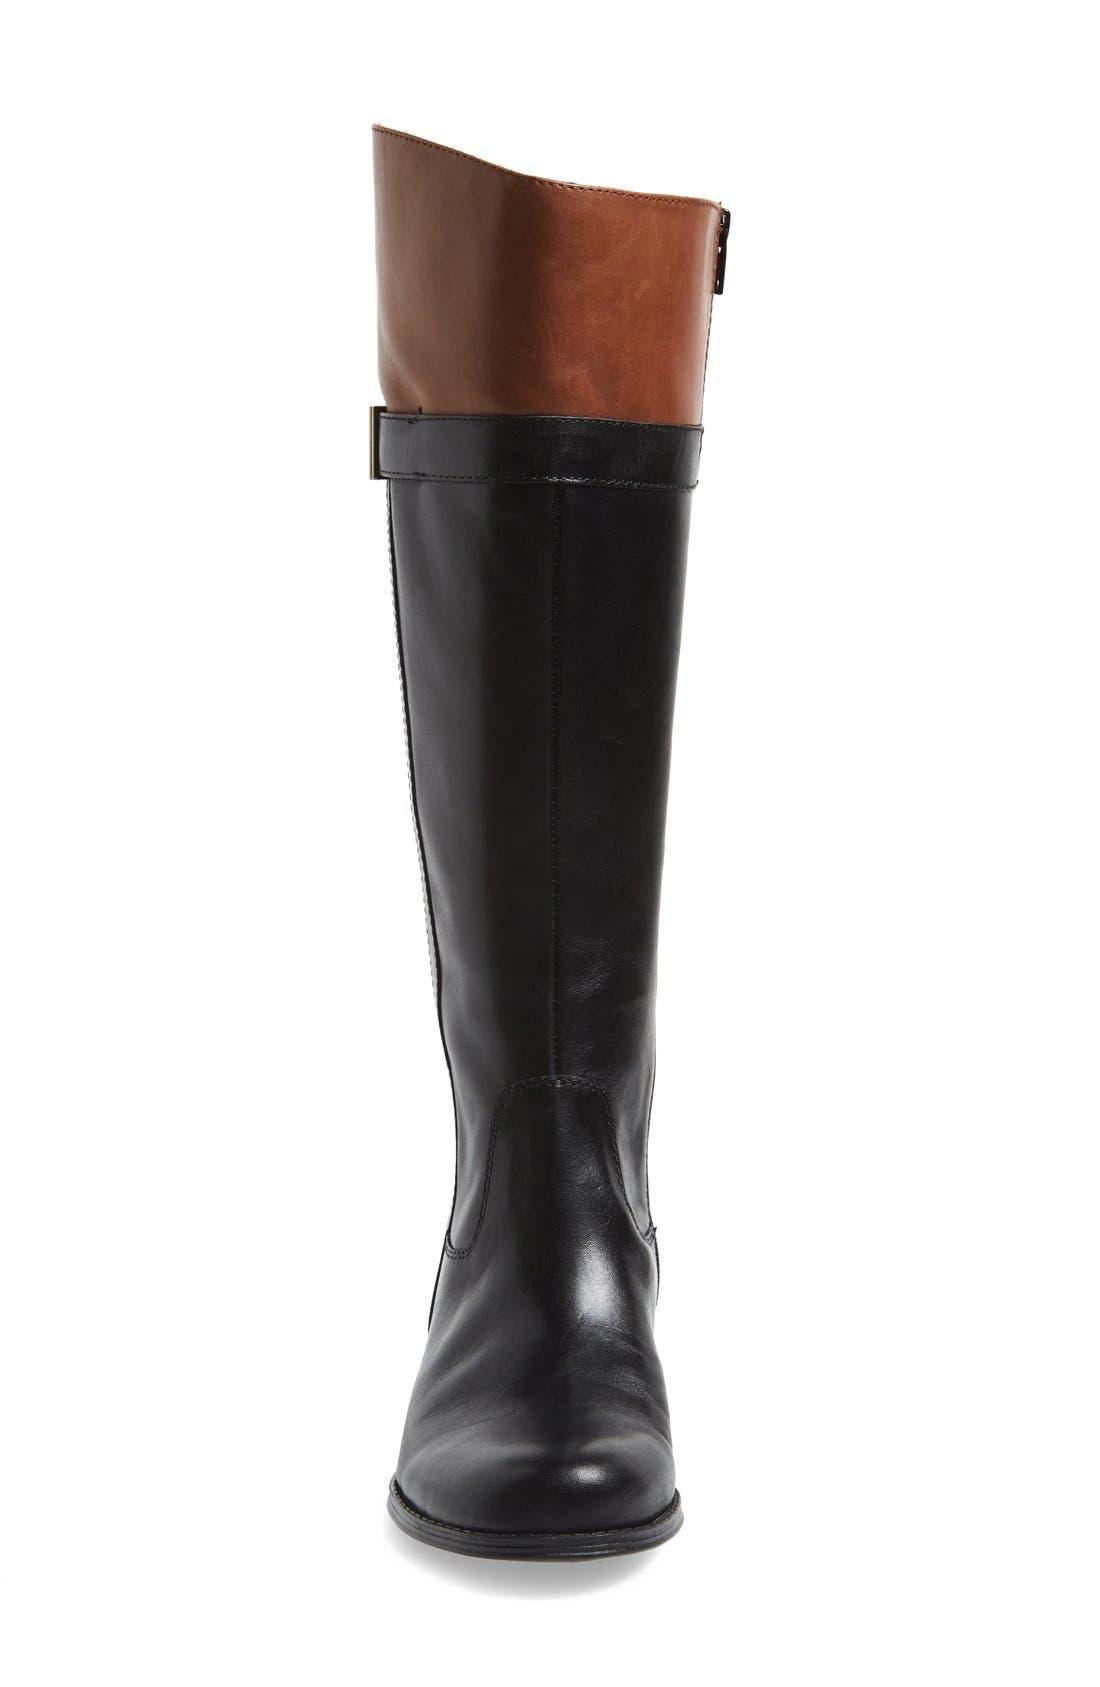 Alternate Image 3  - Naturalizer 'Josette' Knee High Boot (Wide Calf) (Women)